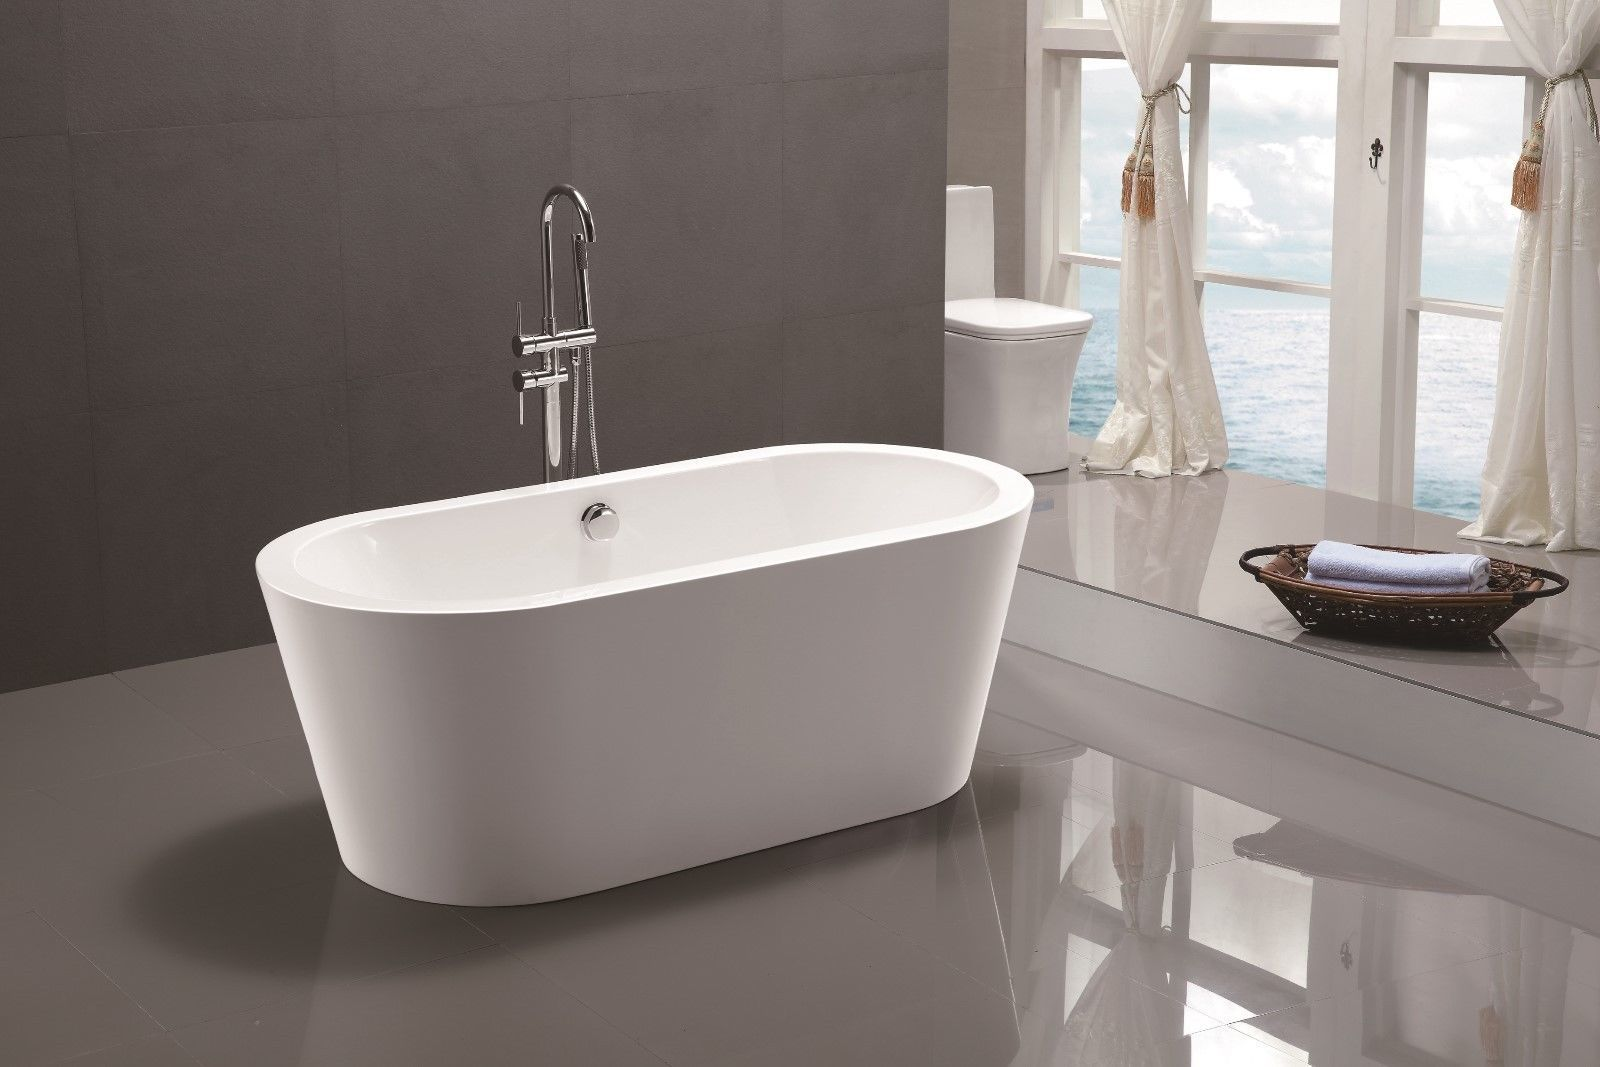 Sensational Vanity Art White Acrylic 59 Inch And 50 Similar Items Download Free Architecture Designs Rallybritishbridgeorg